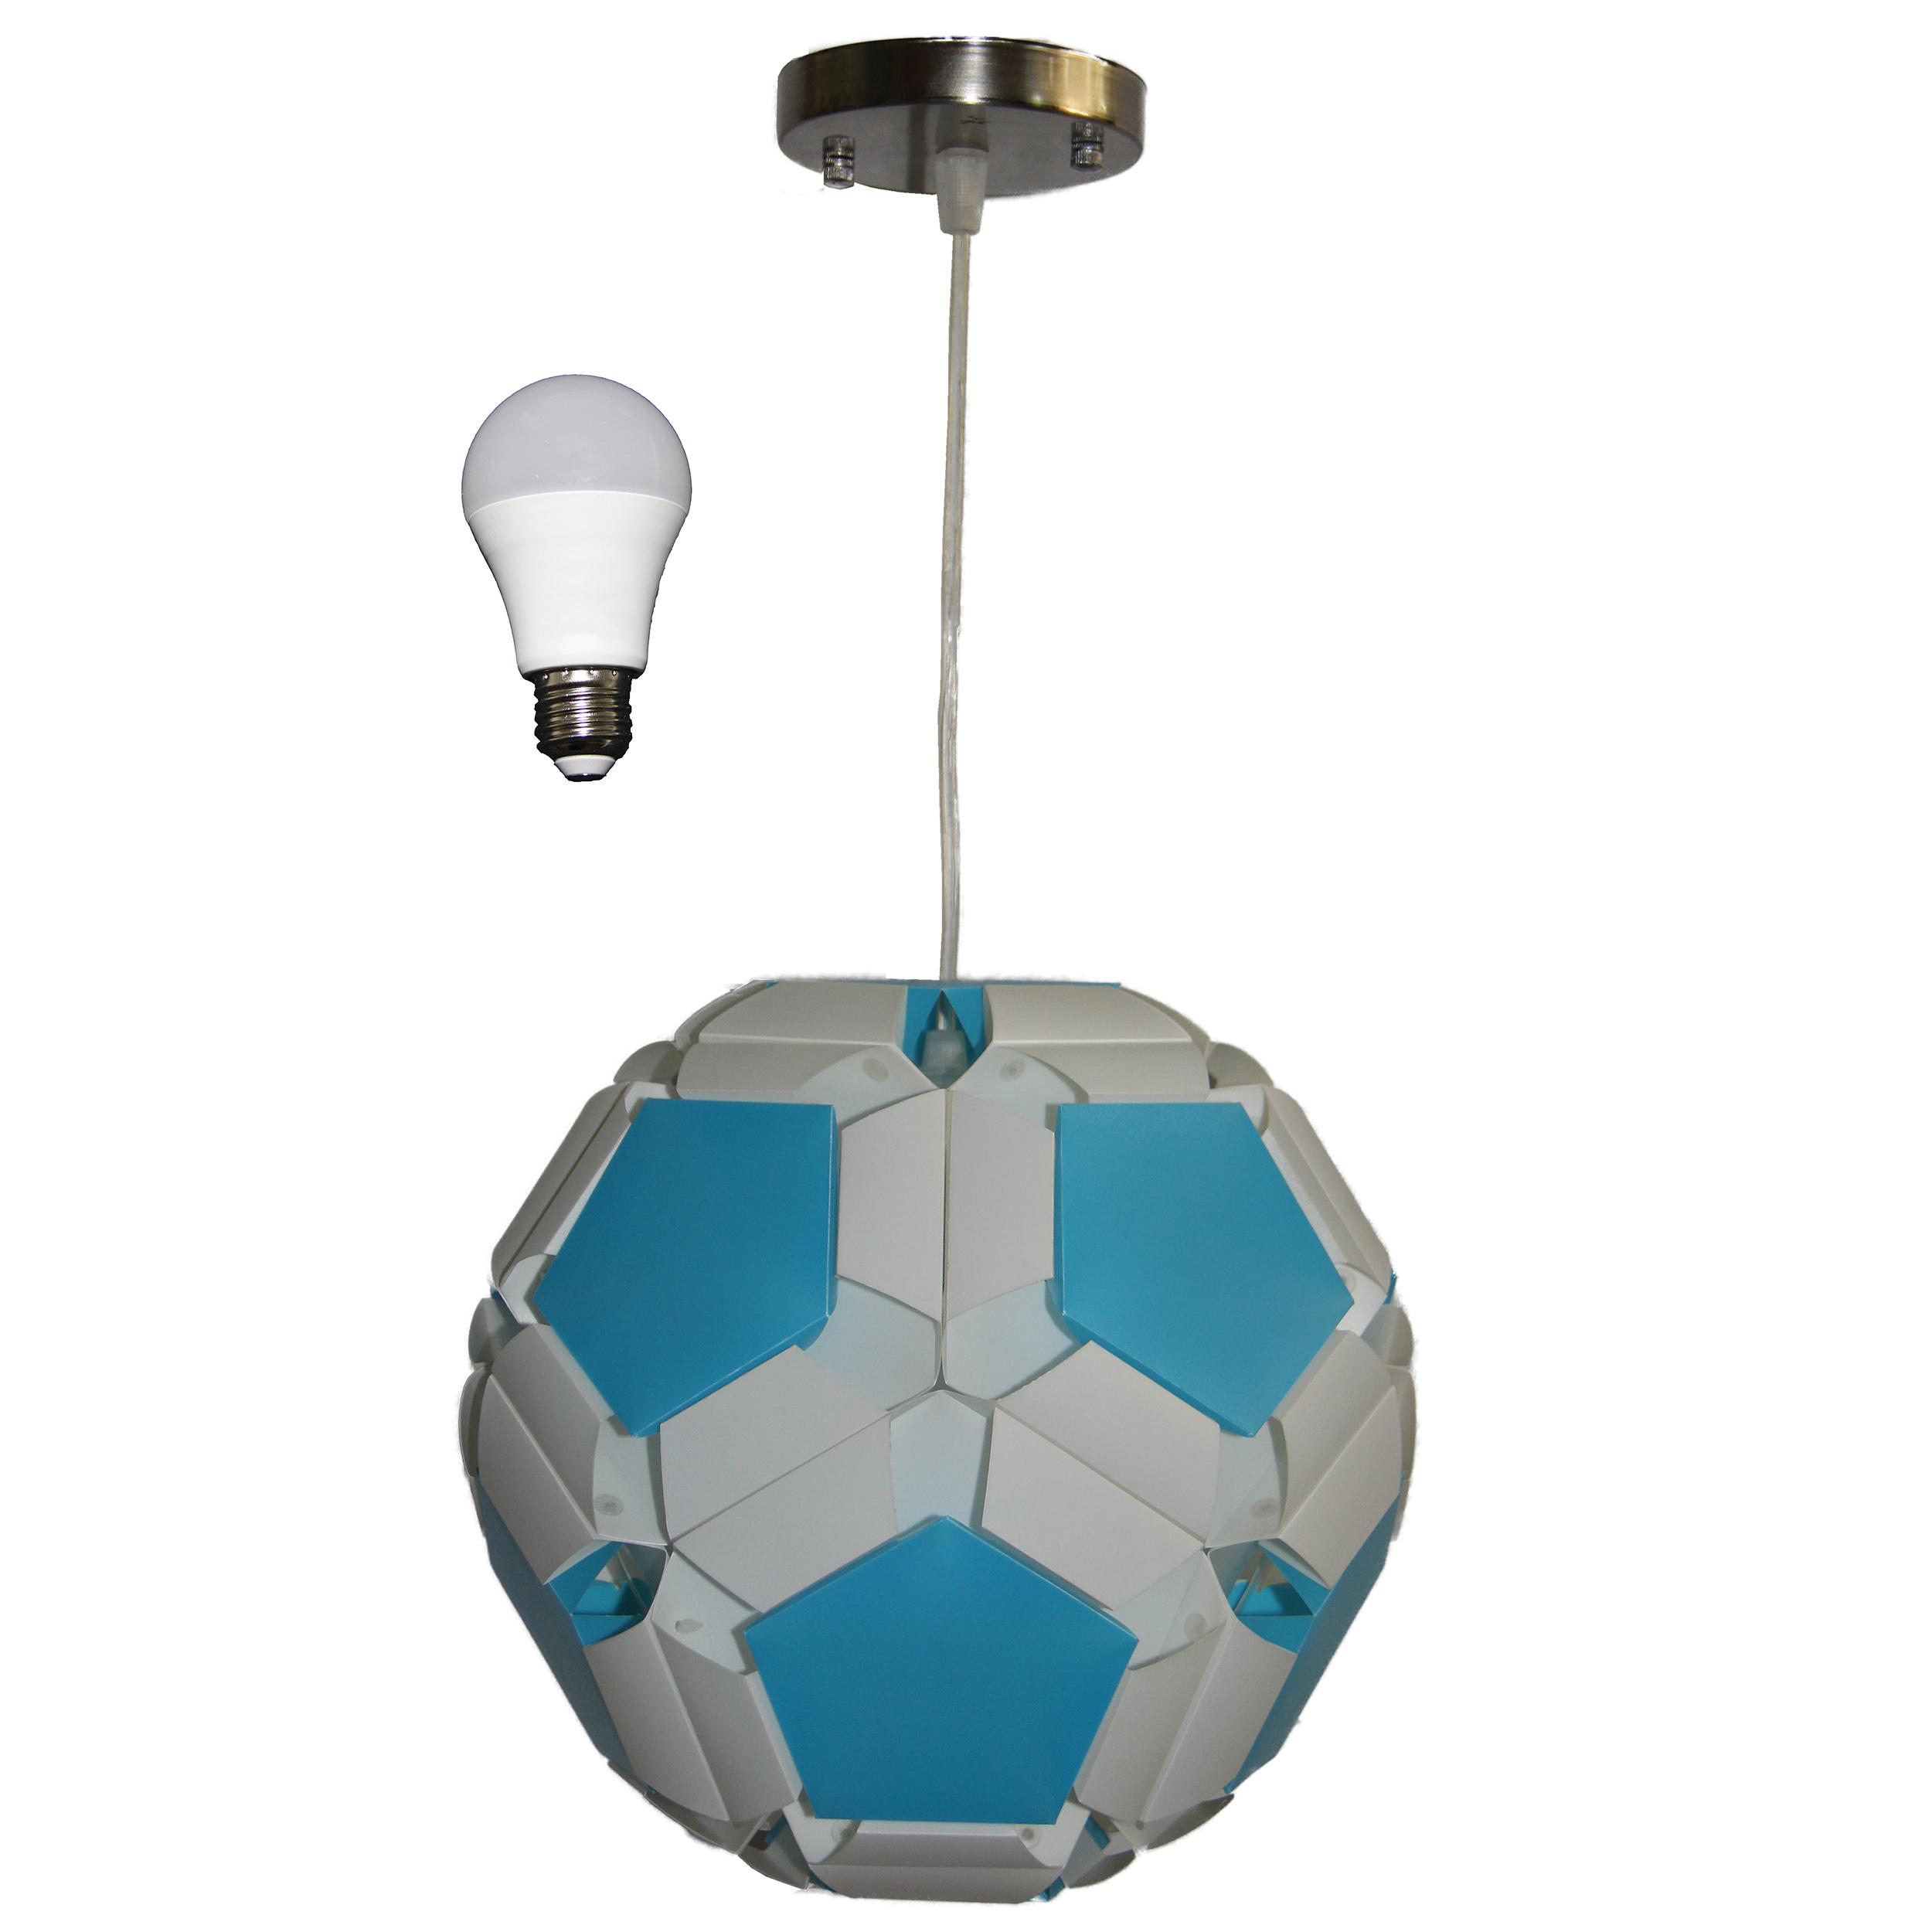 لوستر کودک مدل توپ فوتبال